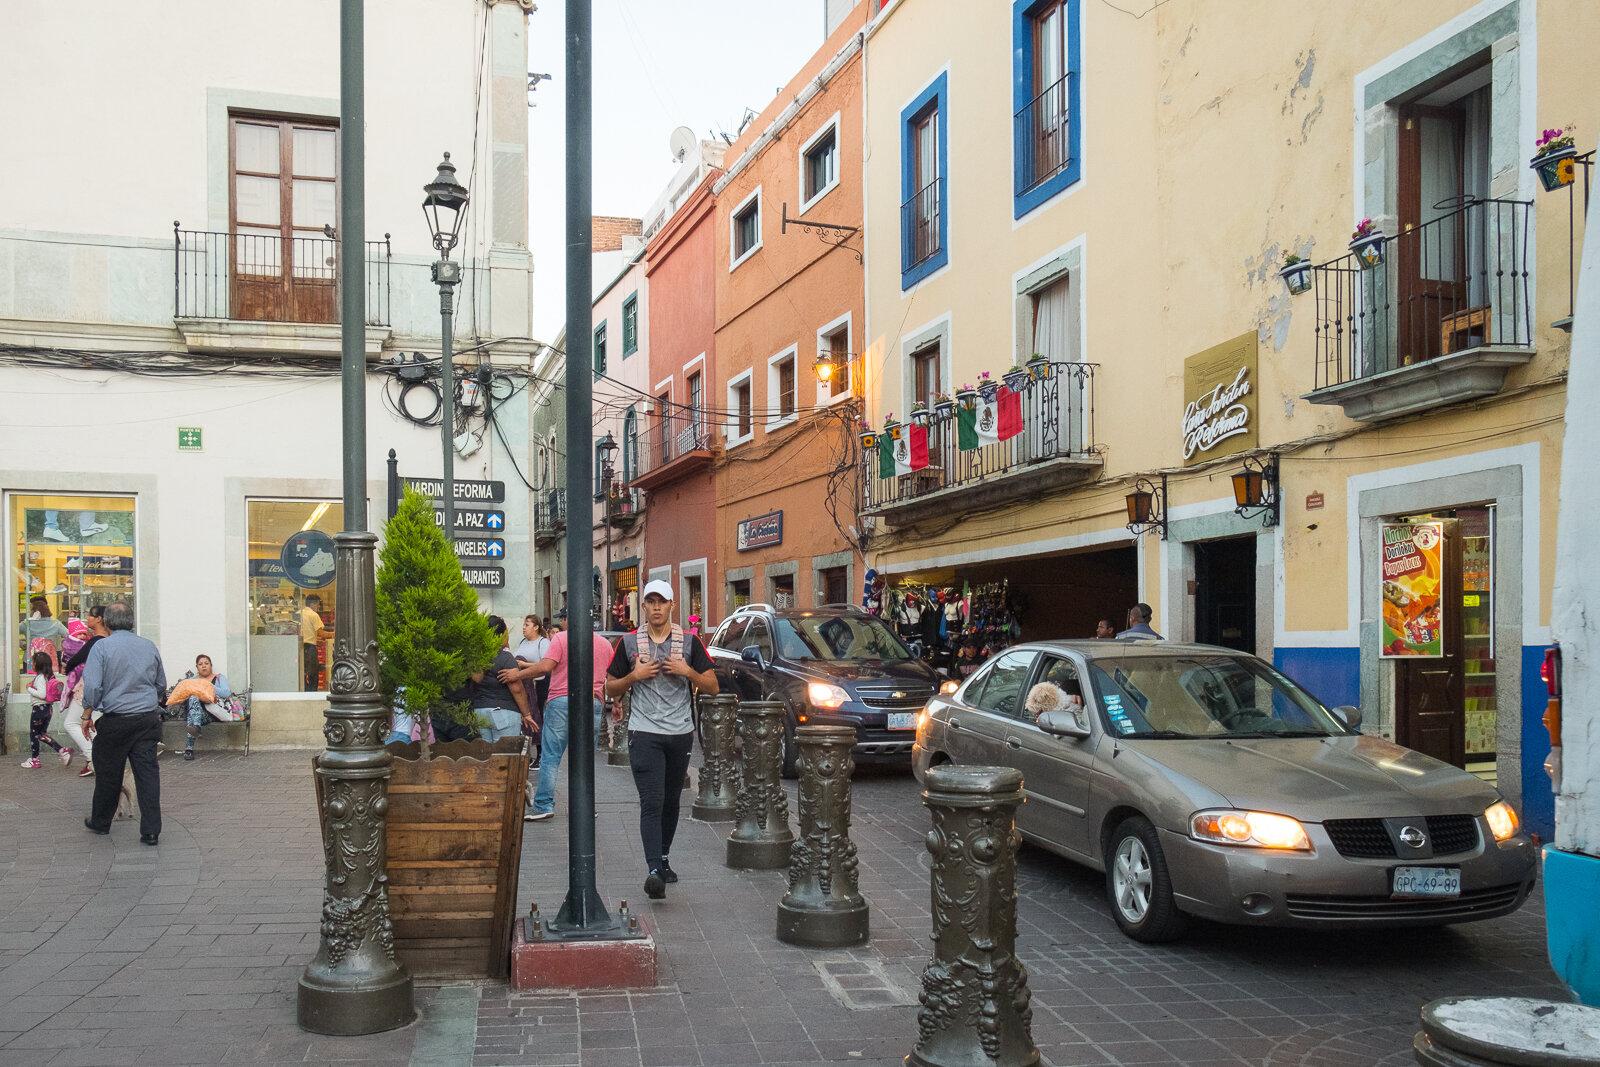 2019.10.8_Mexico_Guanajuato26_Britt first year.jpg